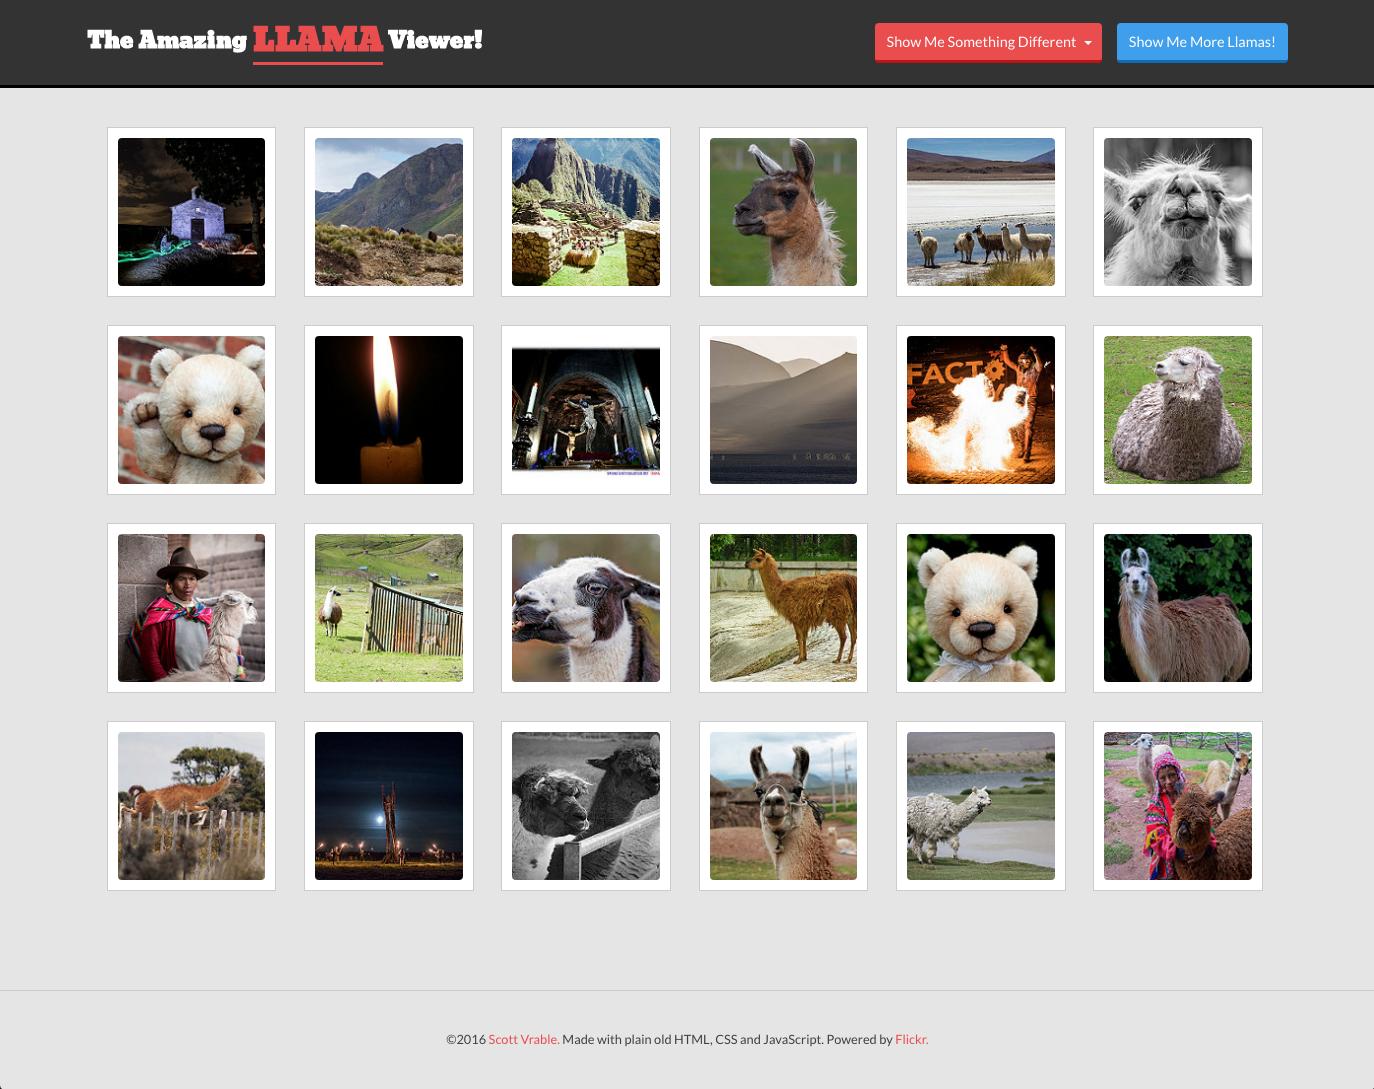 llama viewer screenshot